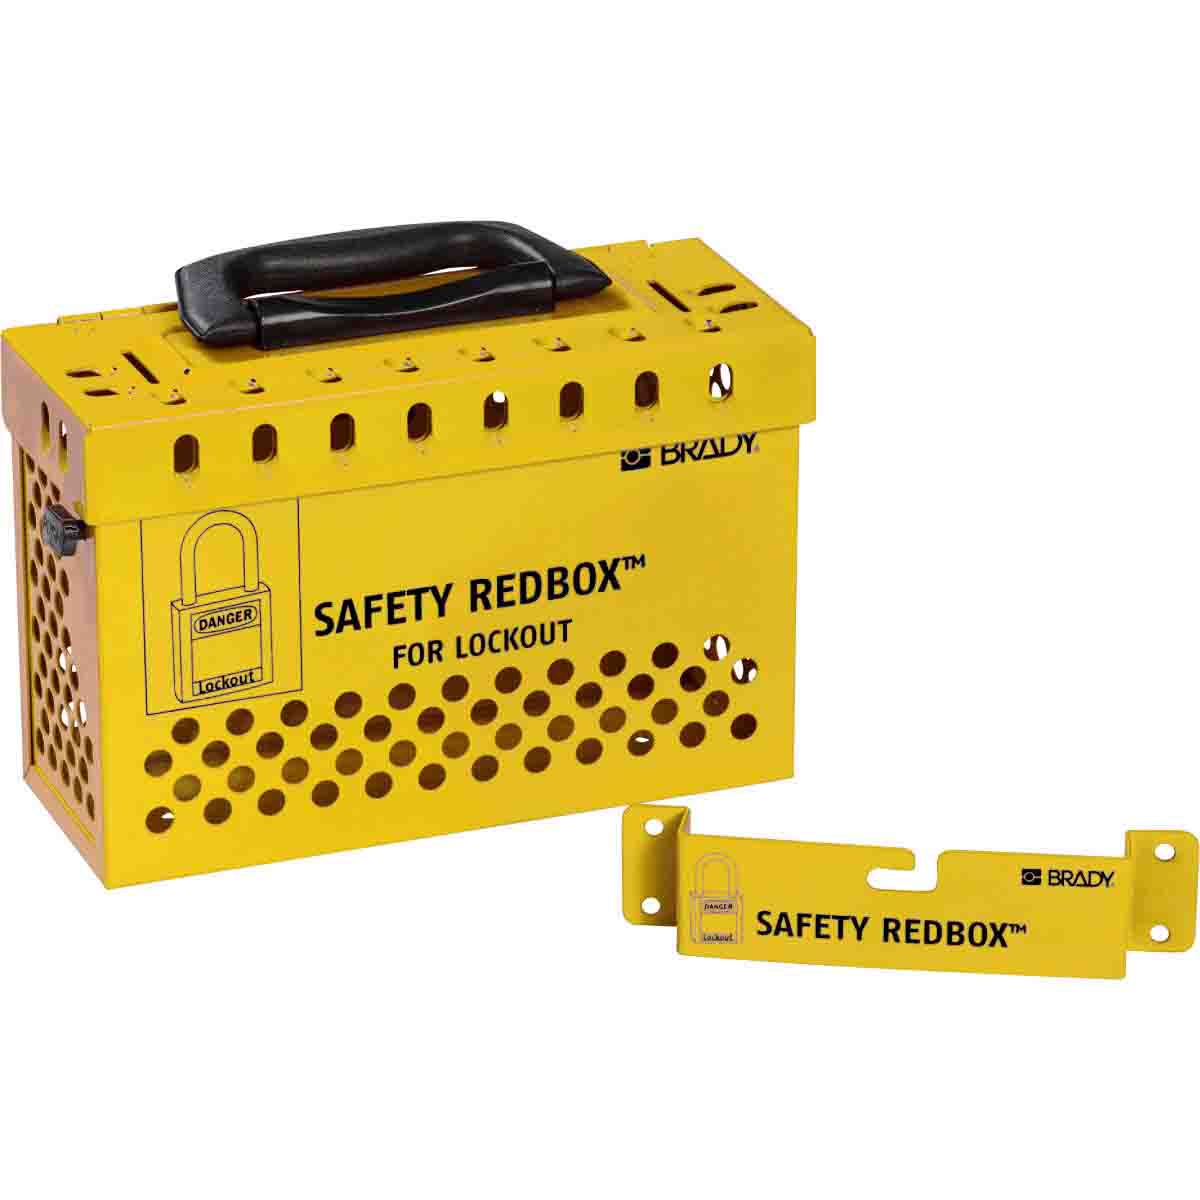 Brady® Safety Redbox® 145580 Empty Portable Group Lockout Box, 12 Padlocks, Steel Door, Yellow, 6.1 in H x 9.3 in W x 3.6 in D, Wall Mount, 12 Key Hooks